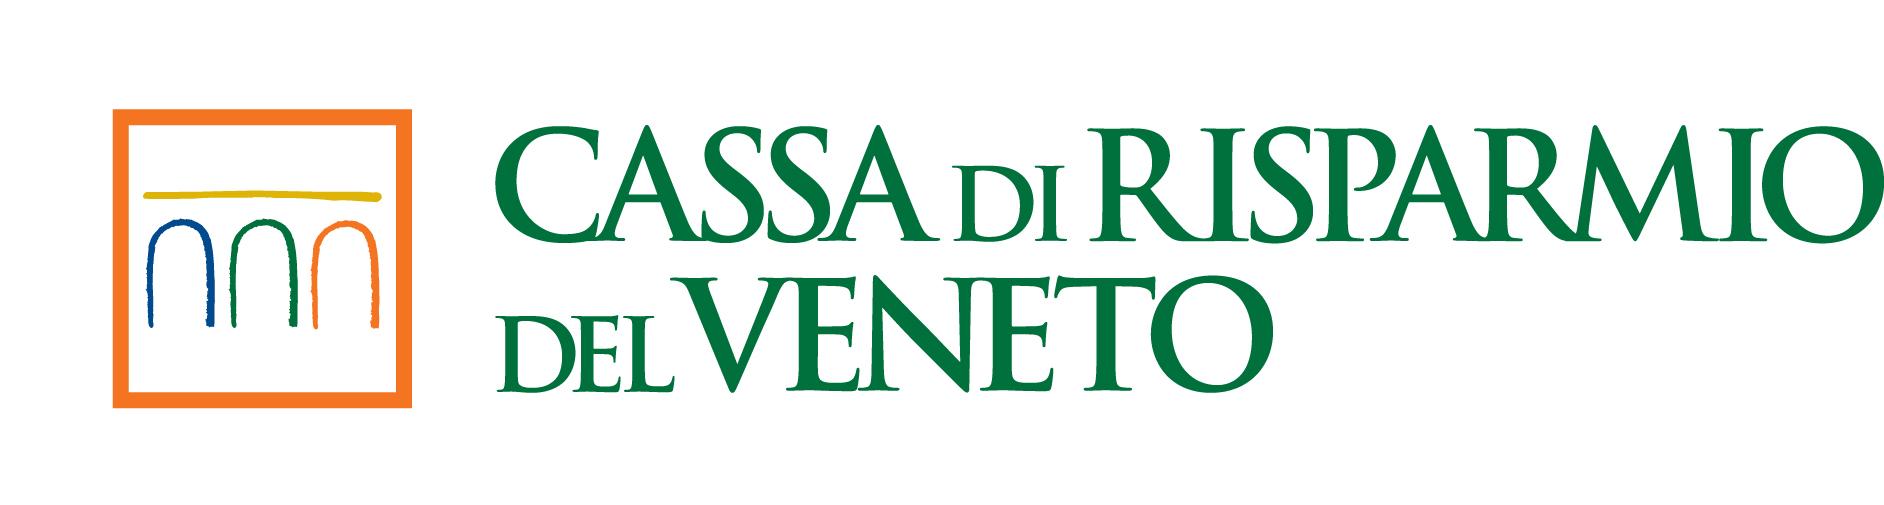 CariVeneto